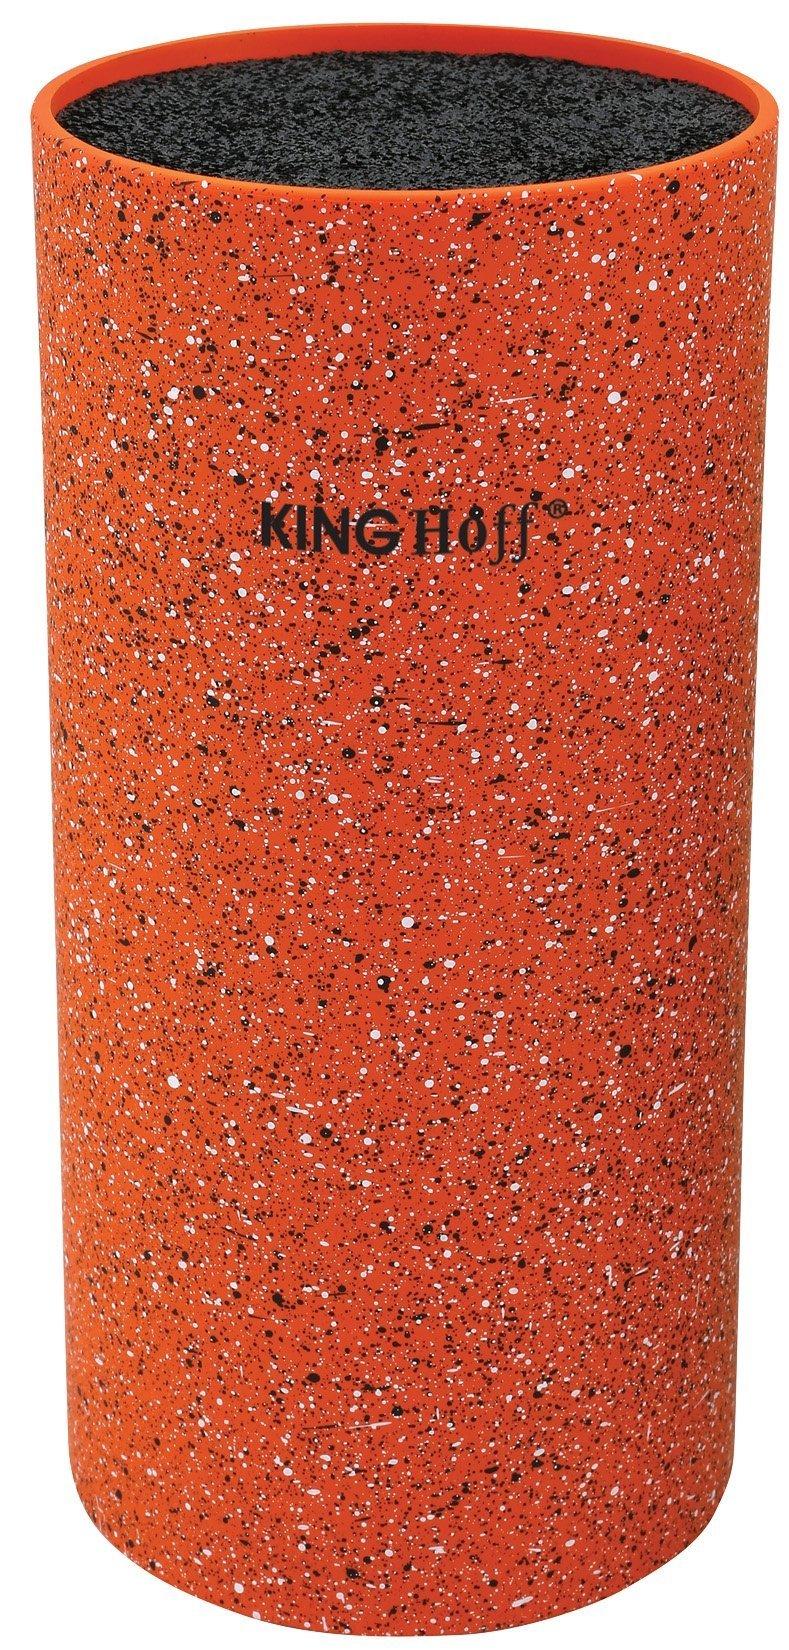 Подставка для ножей KING hoff KH-1120